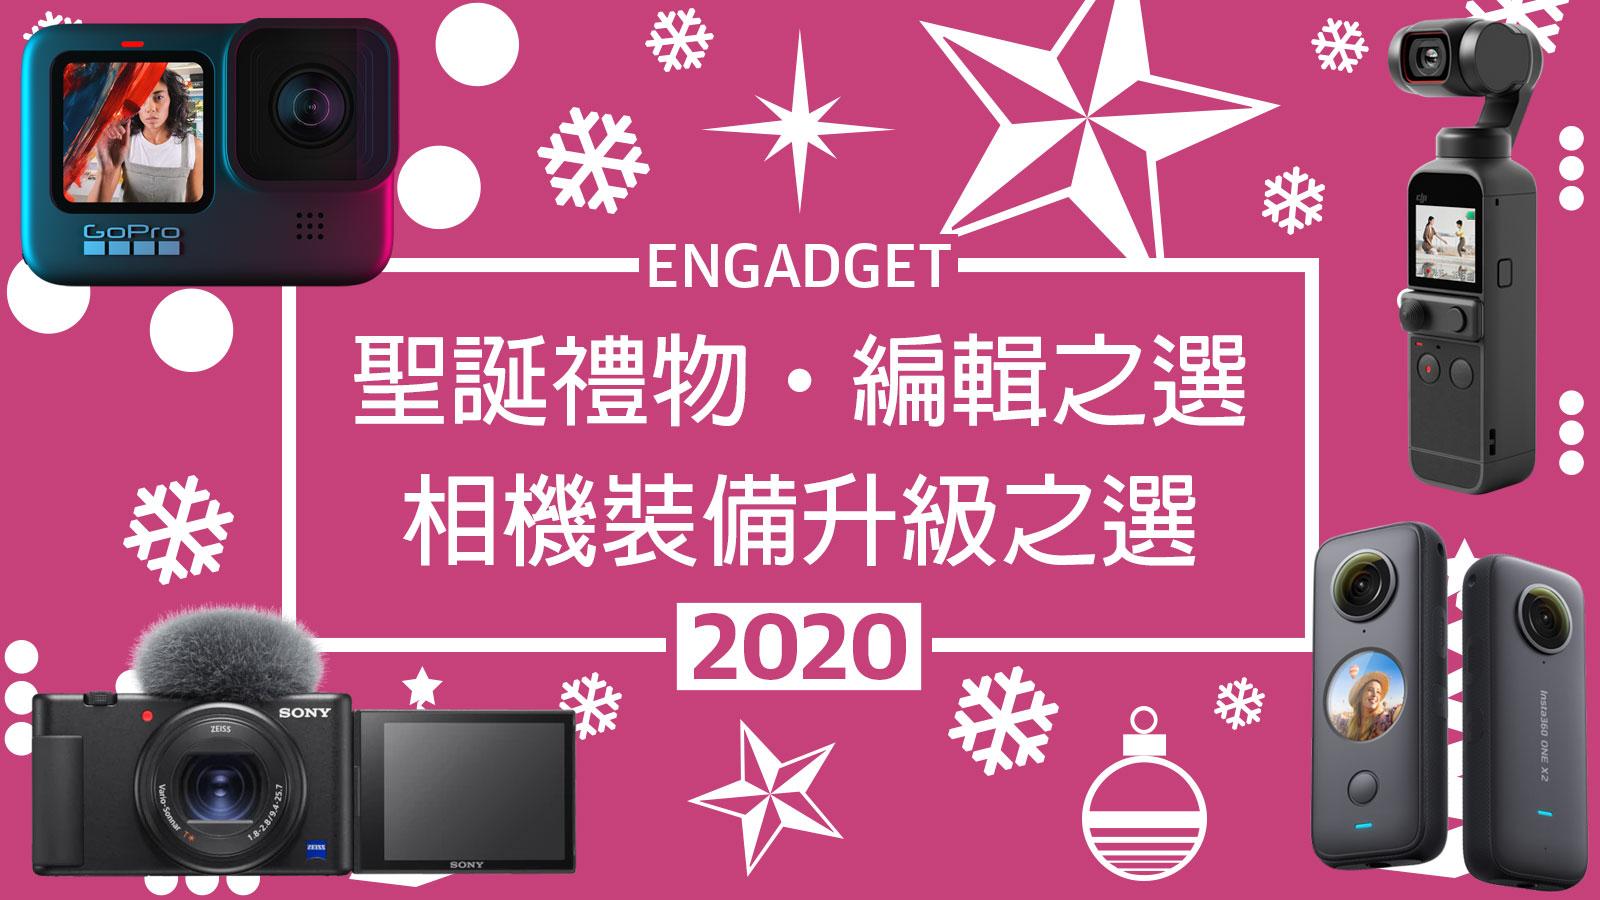 Engadget Xmas gift guide 2020 camera